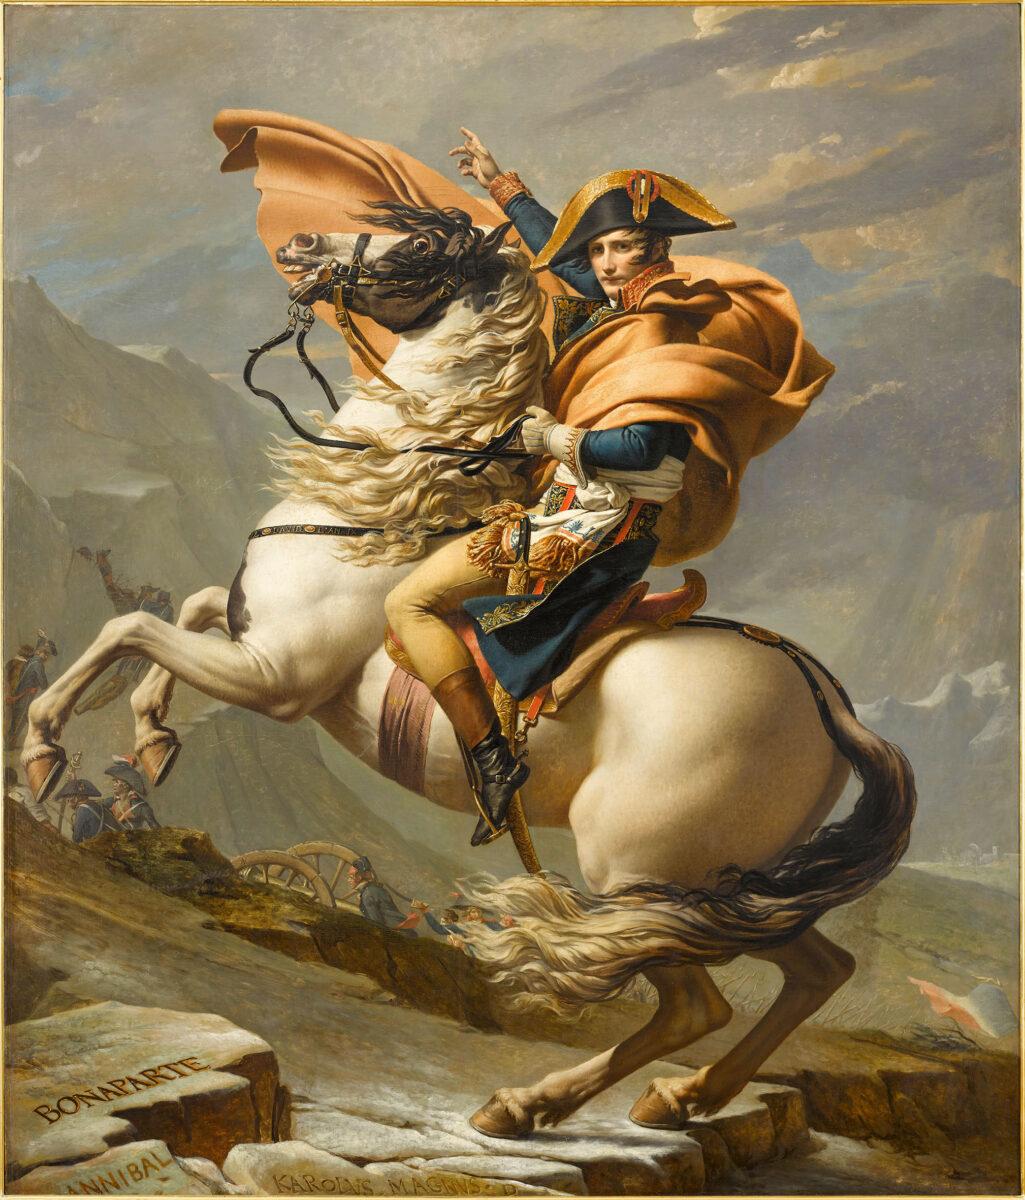 Jacques-Louis David, «Ο Βοναπάρτης διασχίζει το πέρασμα του Μεγάλου Αγίου Βερνάρδου (Άλπεις)», 1800-1801. Λάδι σε καμβά 260x221 εκ. Rueil-Malmaison, Musée national du château de Malmaison, αρ. ευρ. M.M.49.7.1.